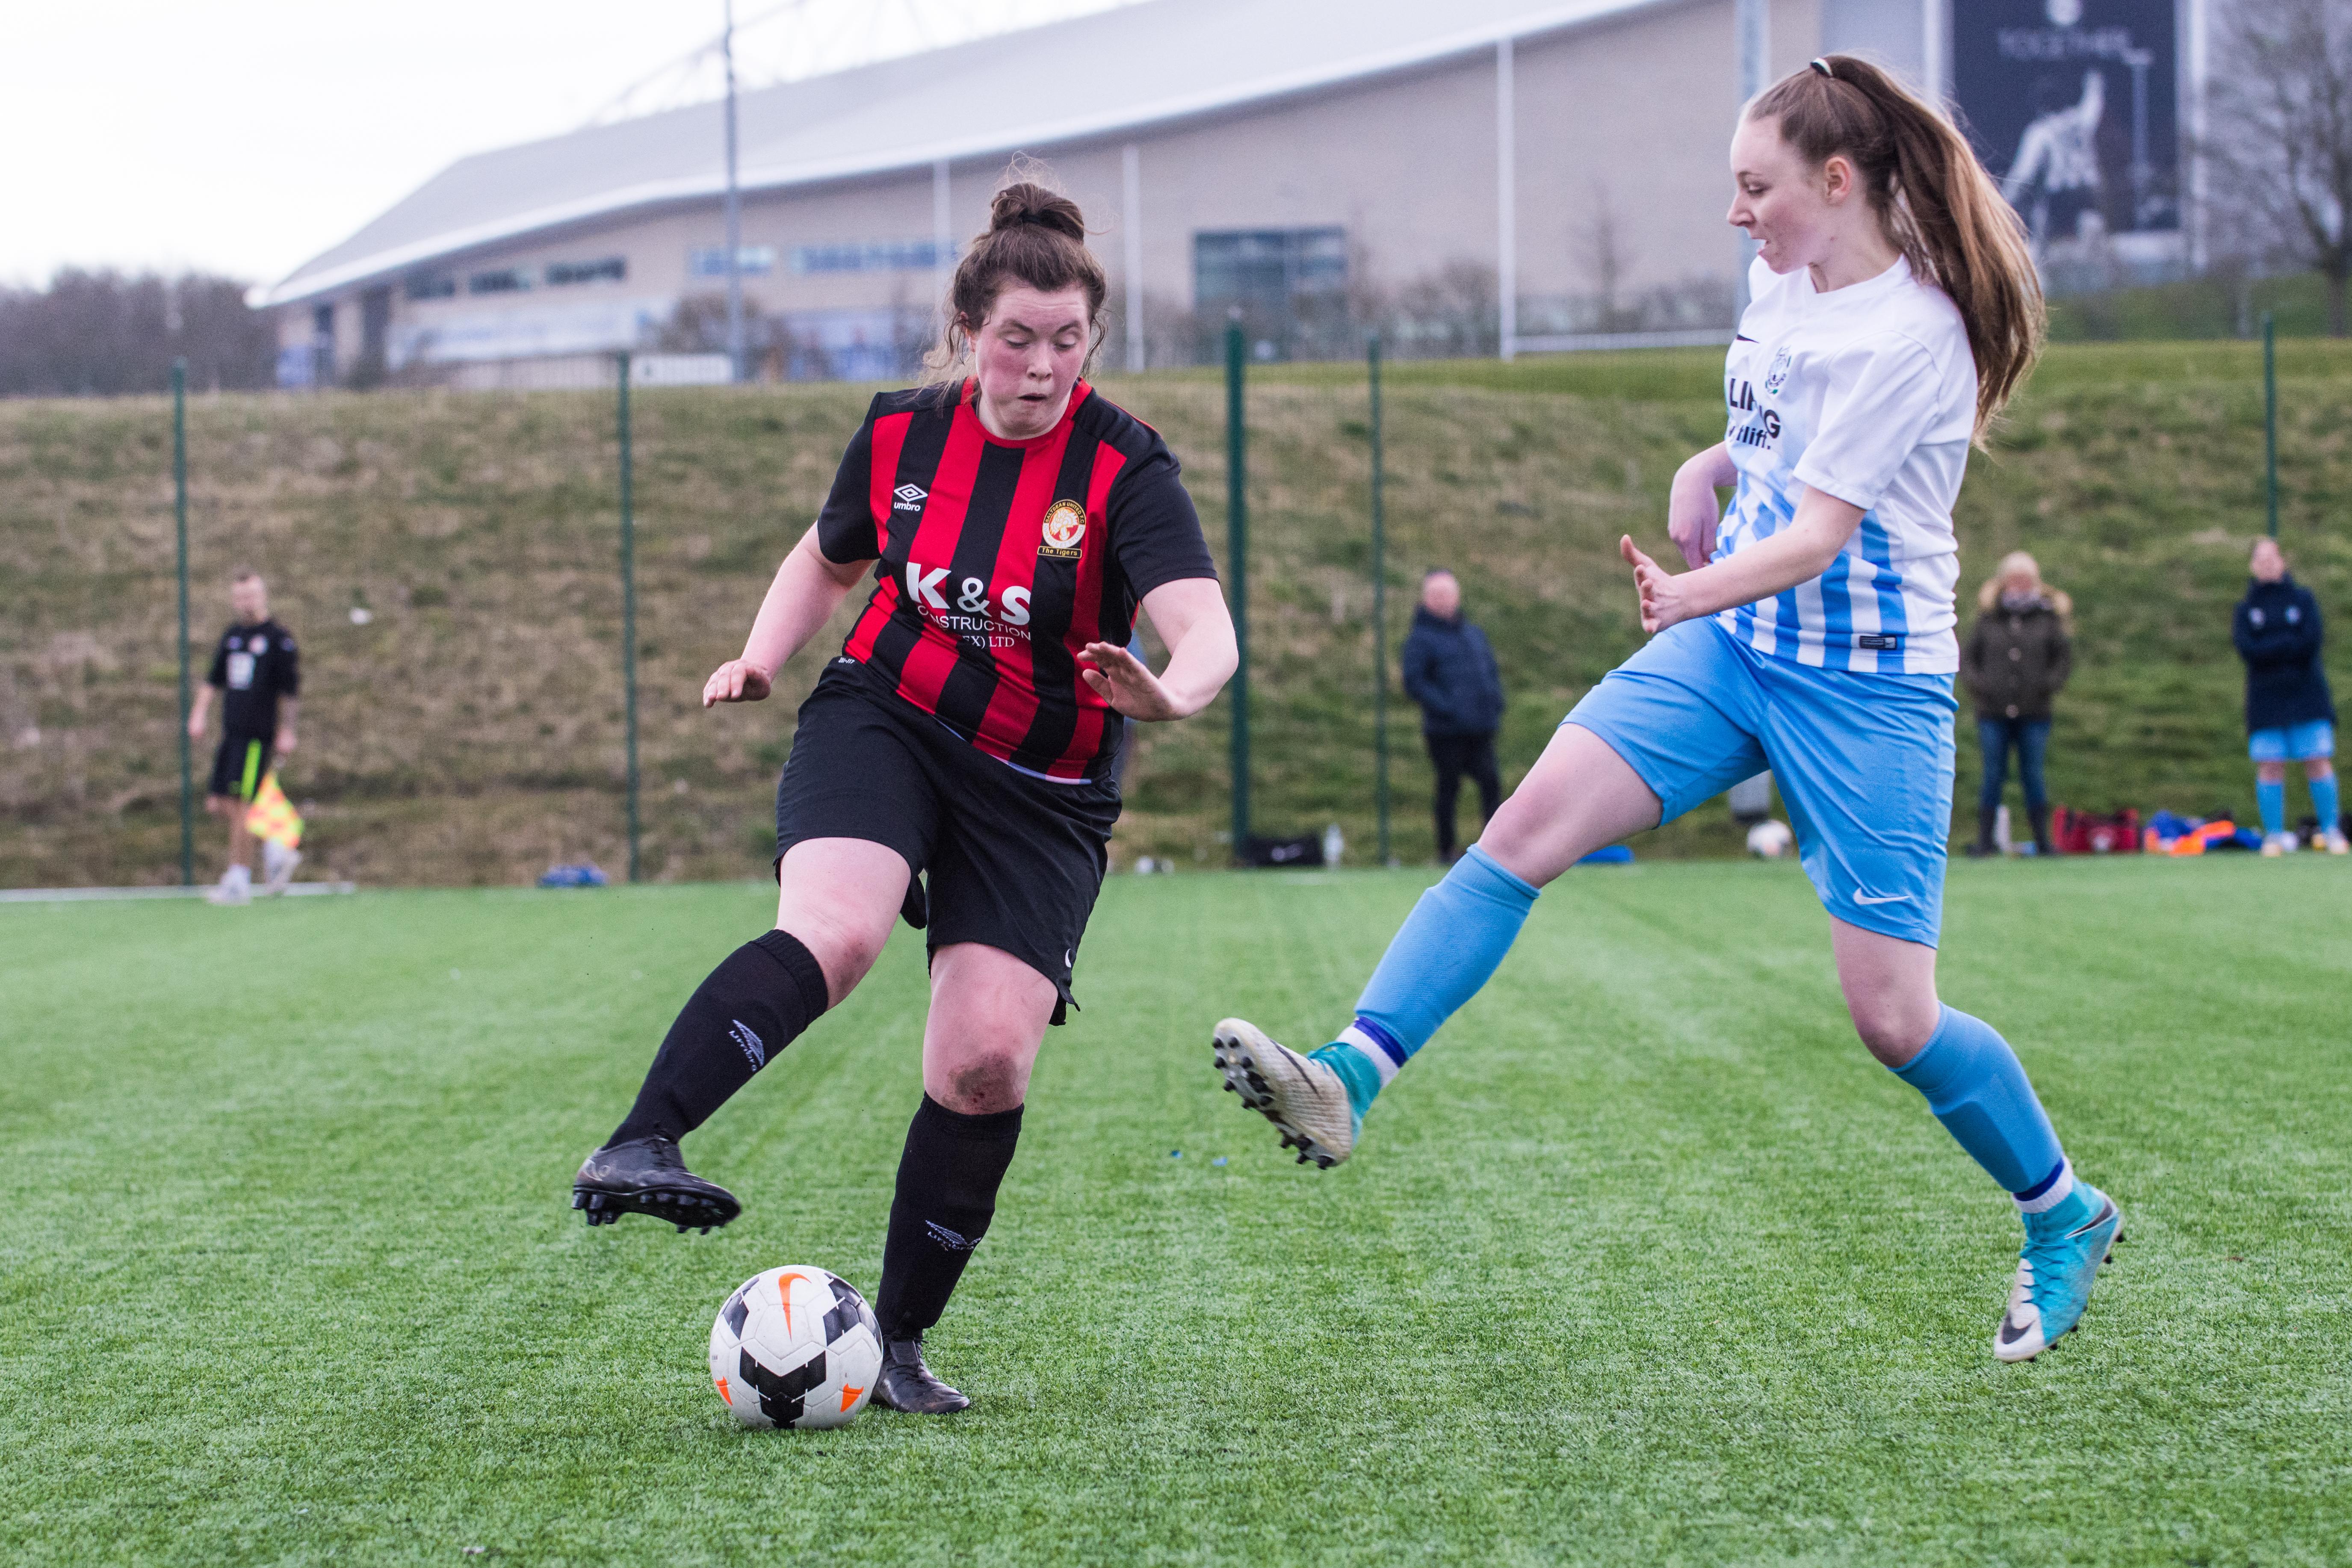 DAVID_JEFFERY Saltdean Utd Ladies FC vs Worthing Utd Ladies FC 11.03.18 51